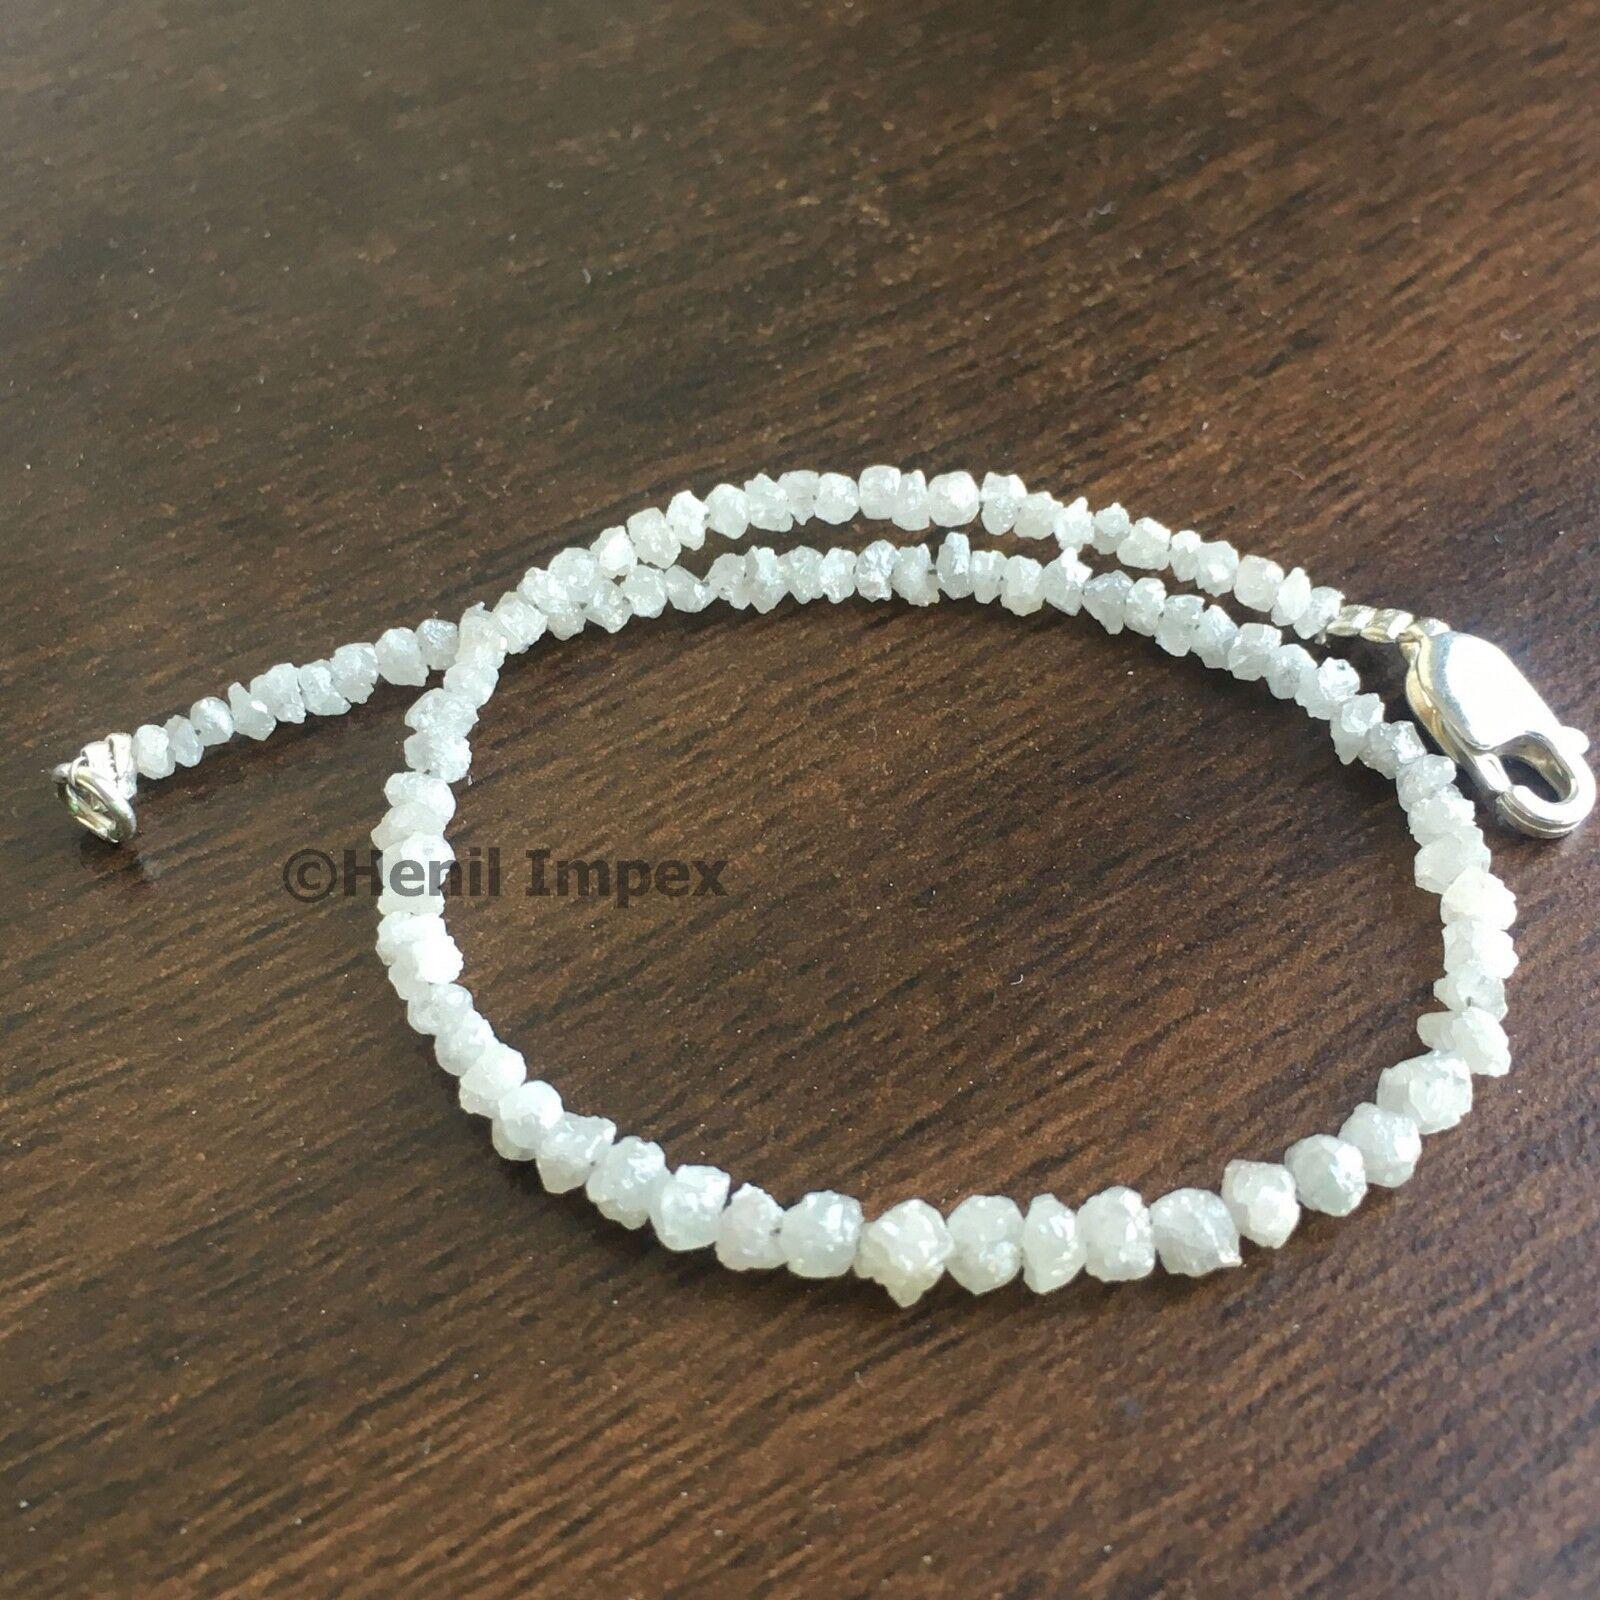 8.50+ TCW natural diamond white color rough loose diamonds beads 8.00  bracelet